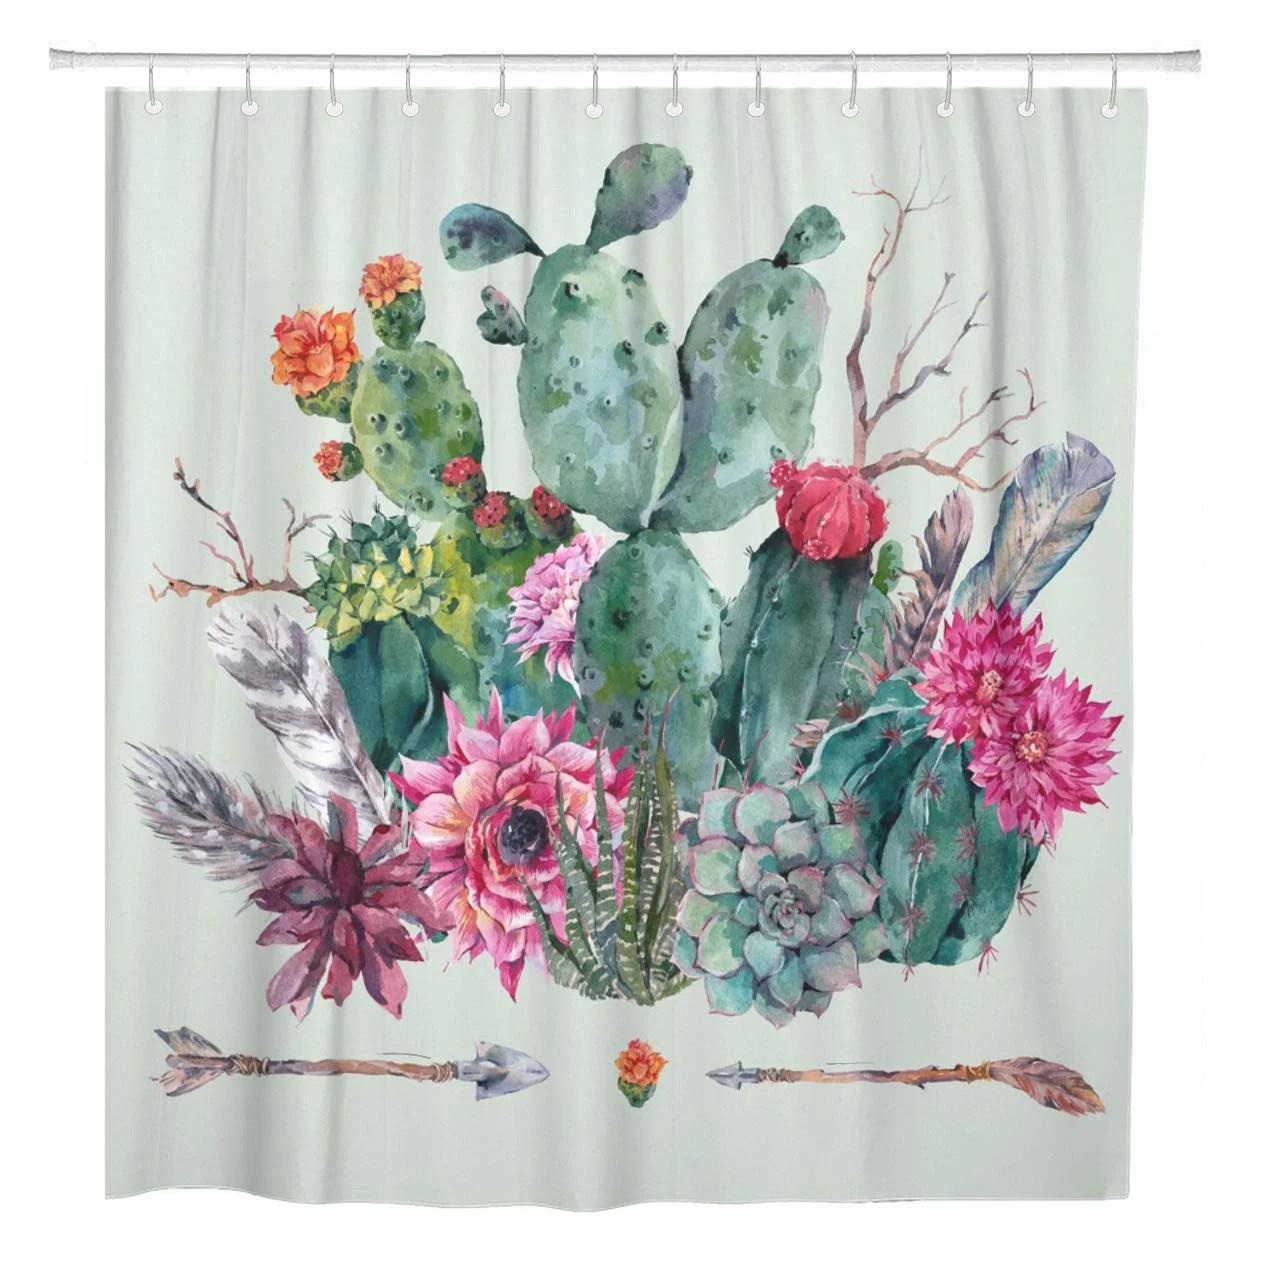 cynlon exotic natural vintage watercolor bouquet in boho cactus succulent bathroom bathroom decor bath shower curtain 66x72 inch